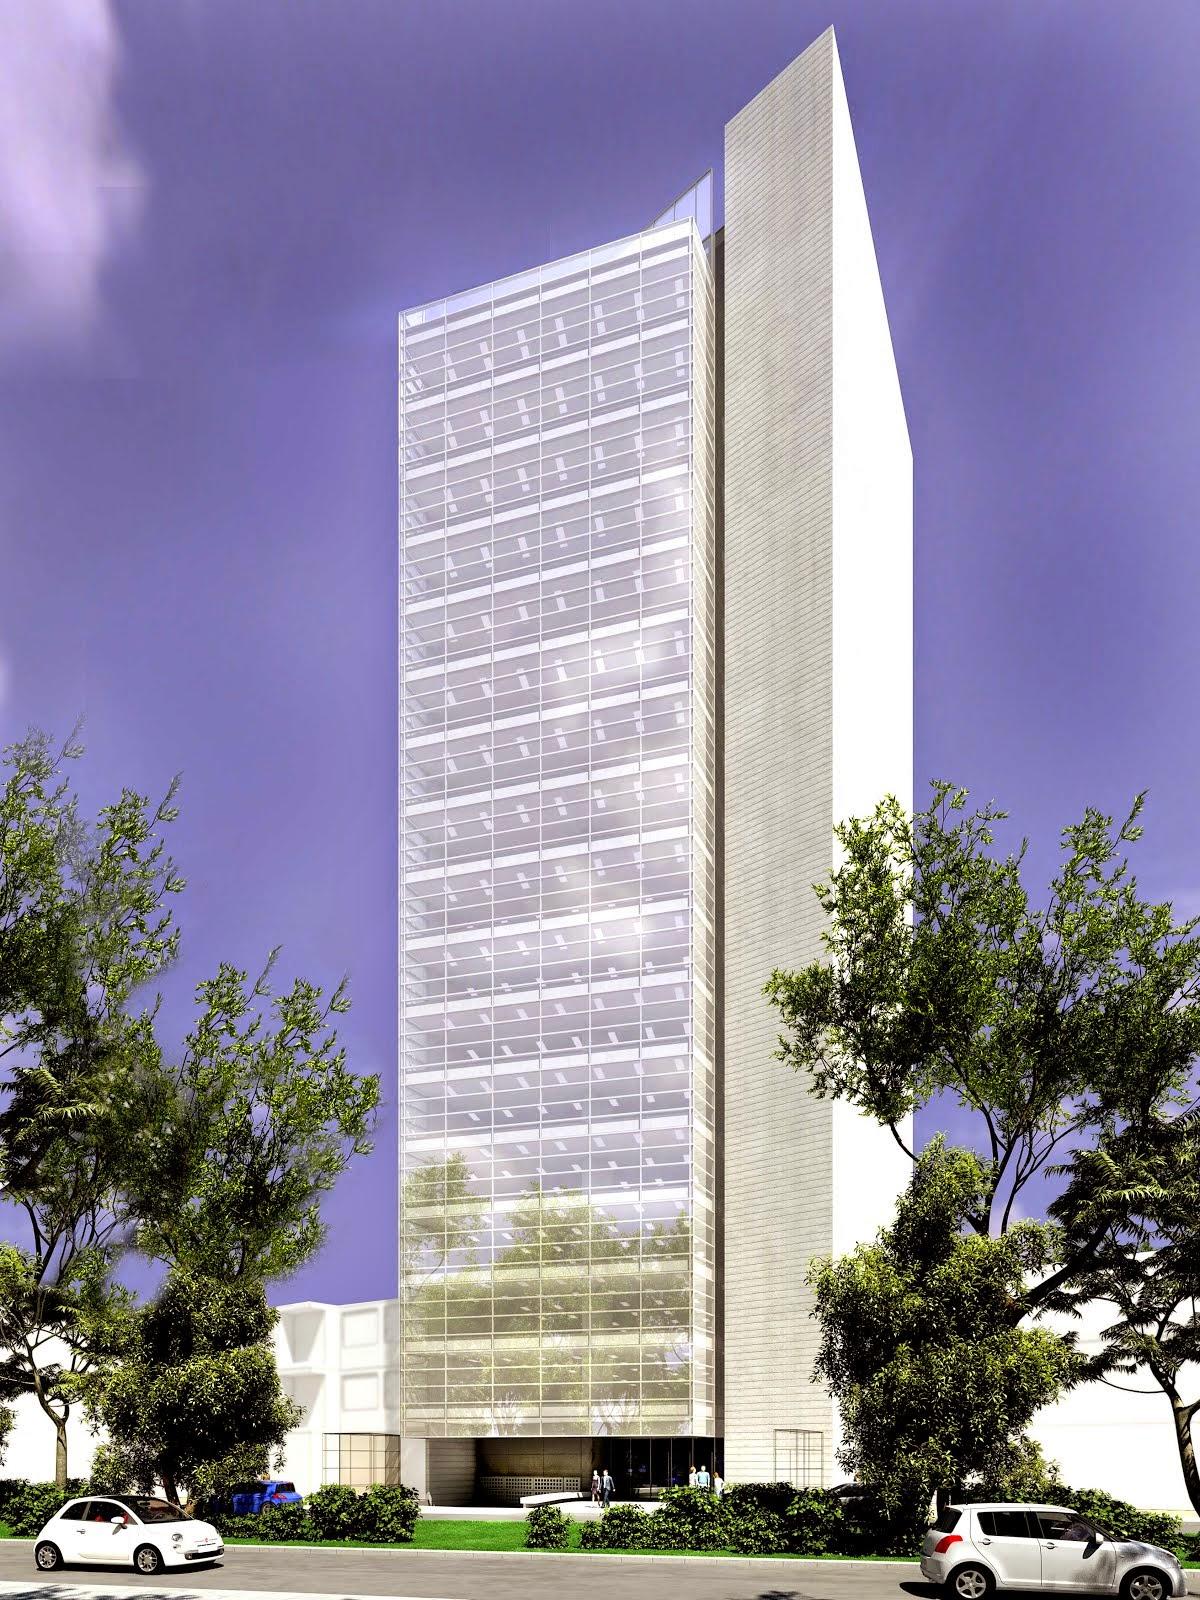 ALIAGA 455 - Edificio de Oficinas. Lima, Perú.